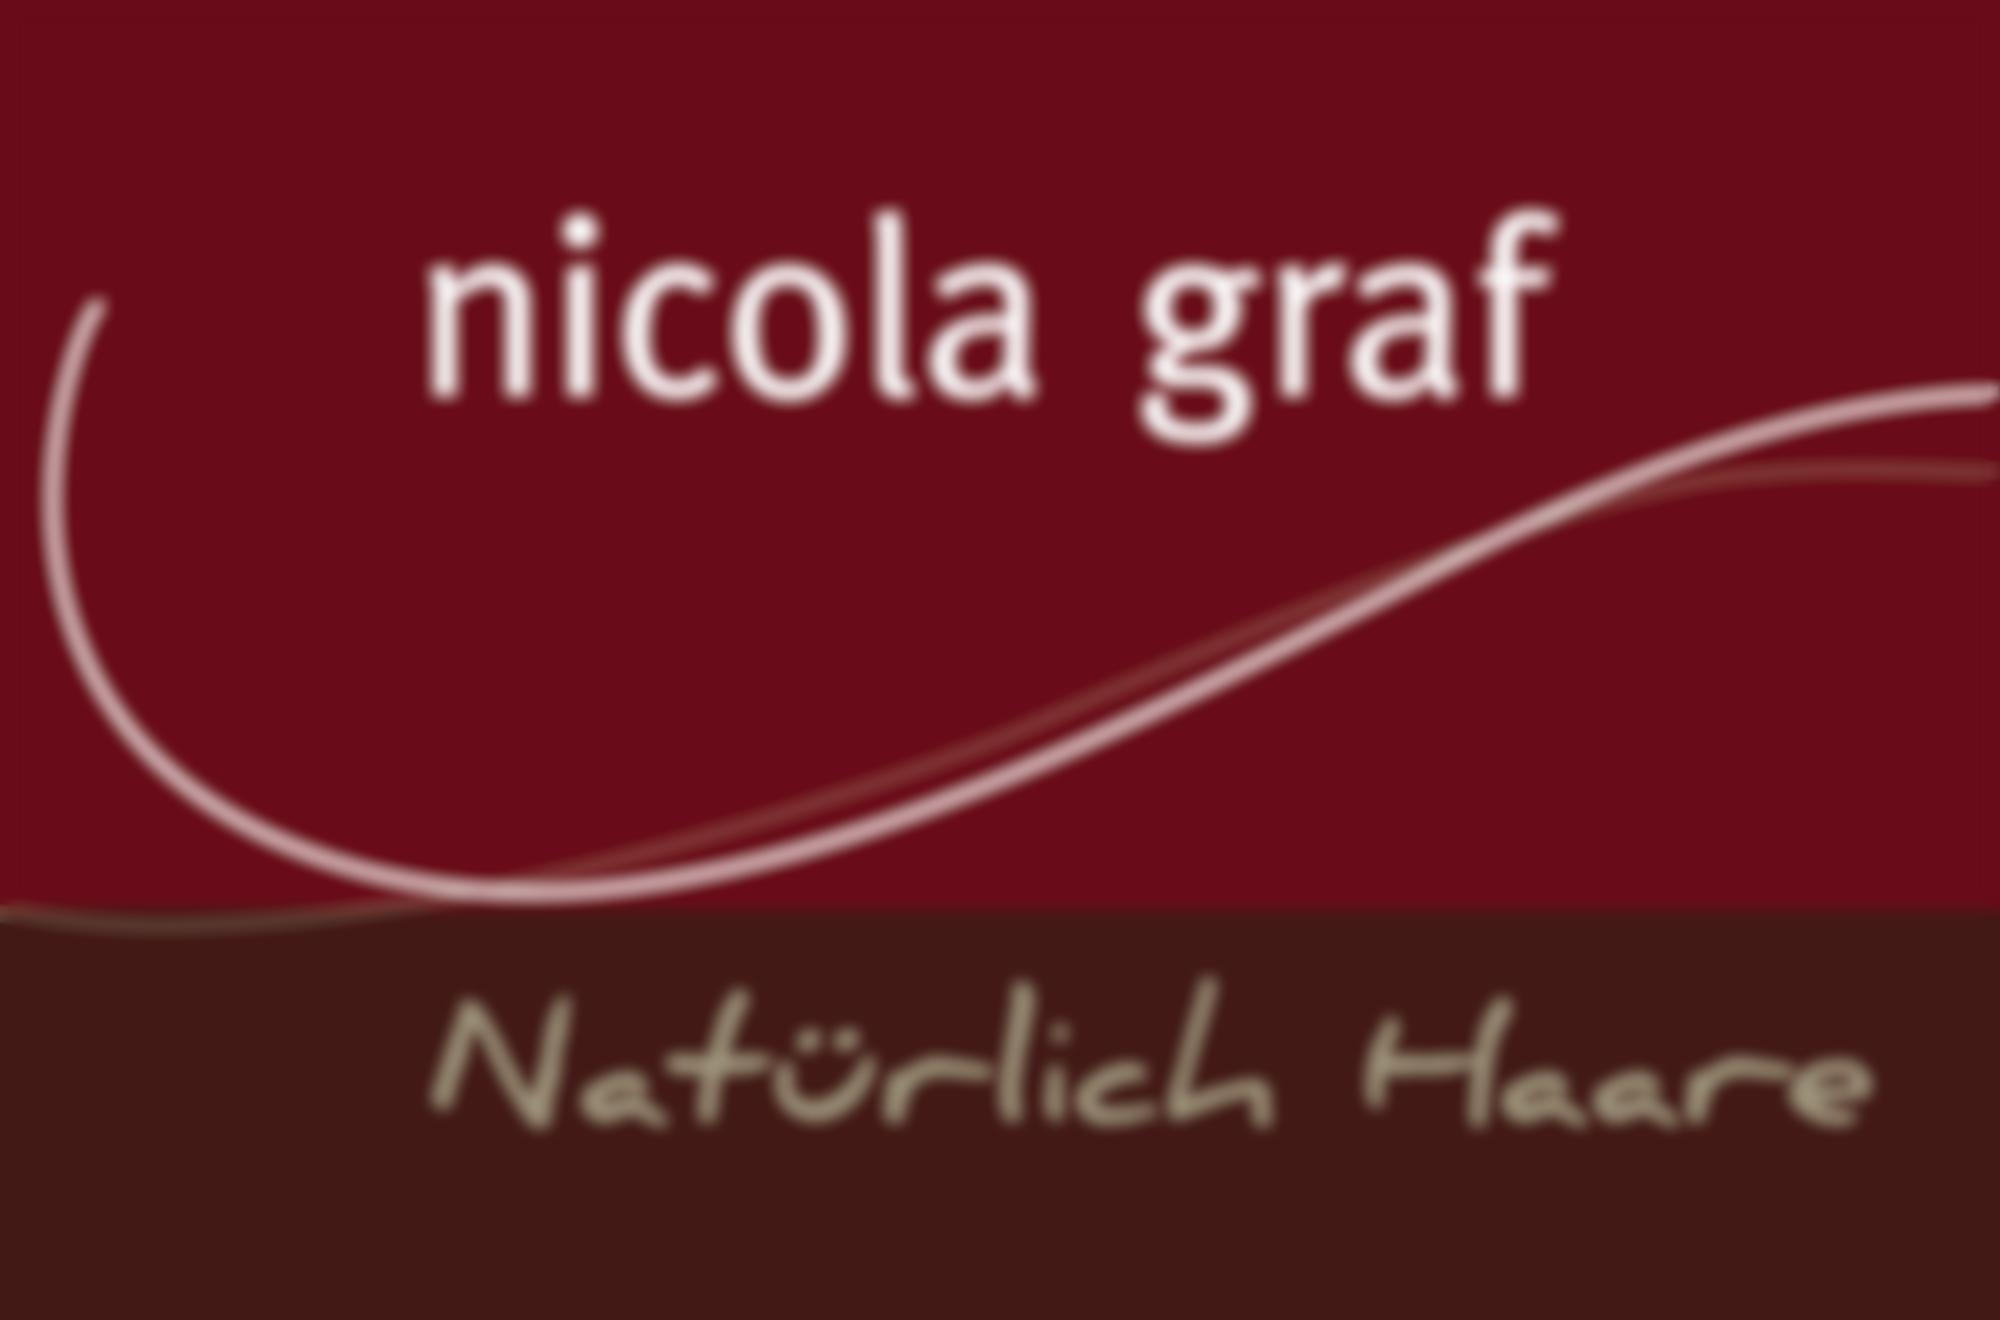 Nicola Graf